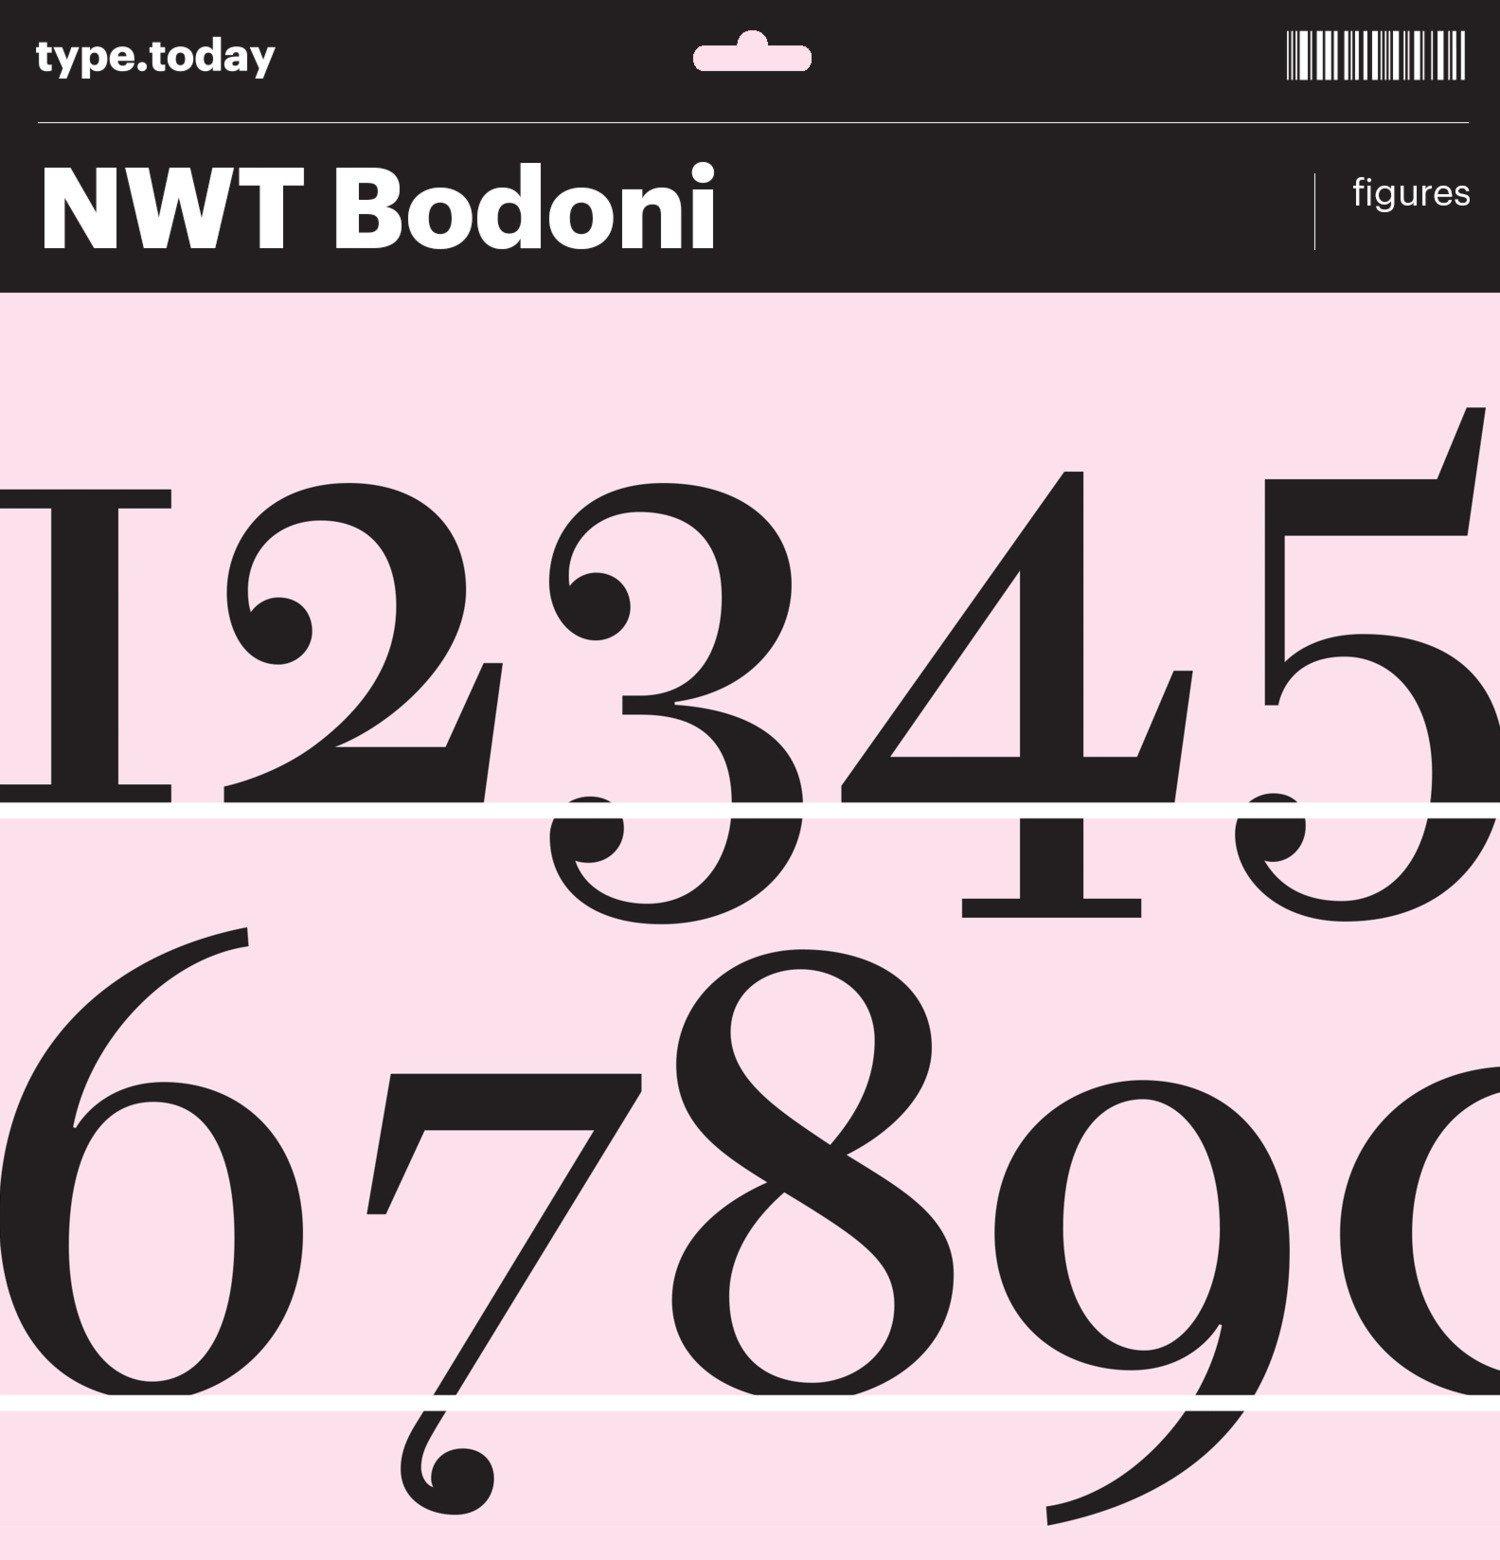 TT_Bodoni_Figures